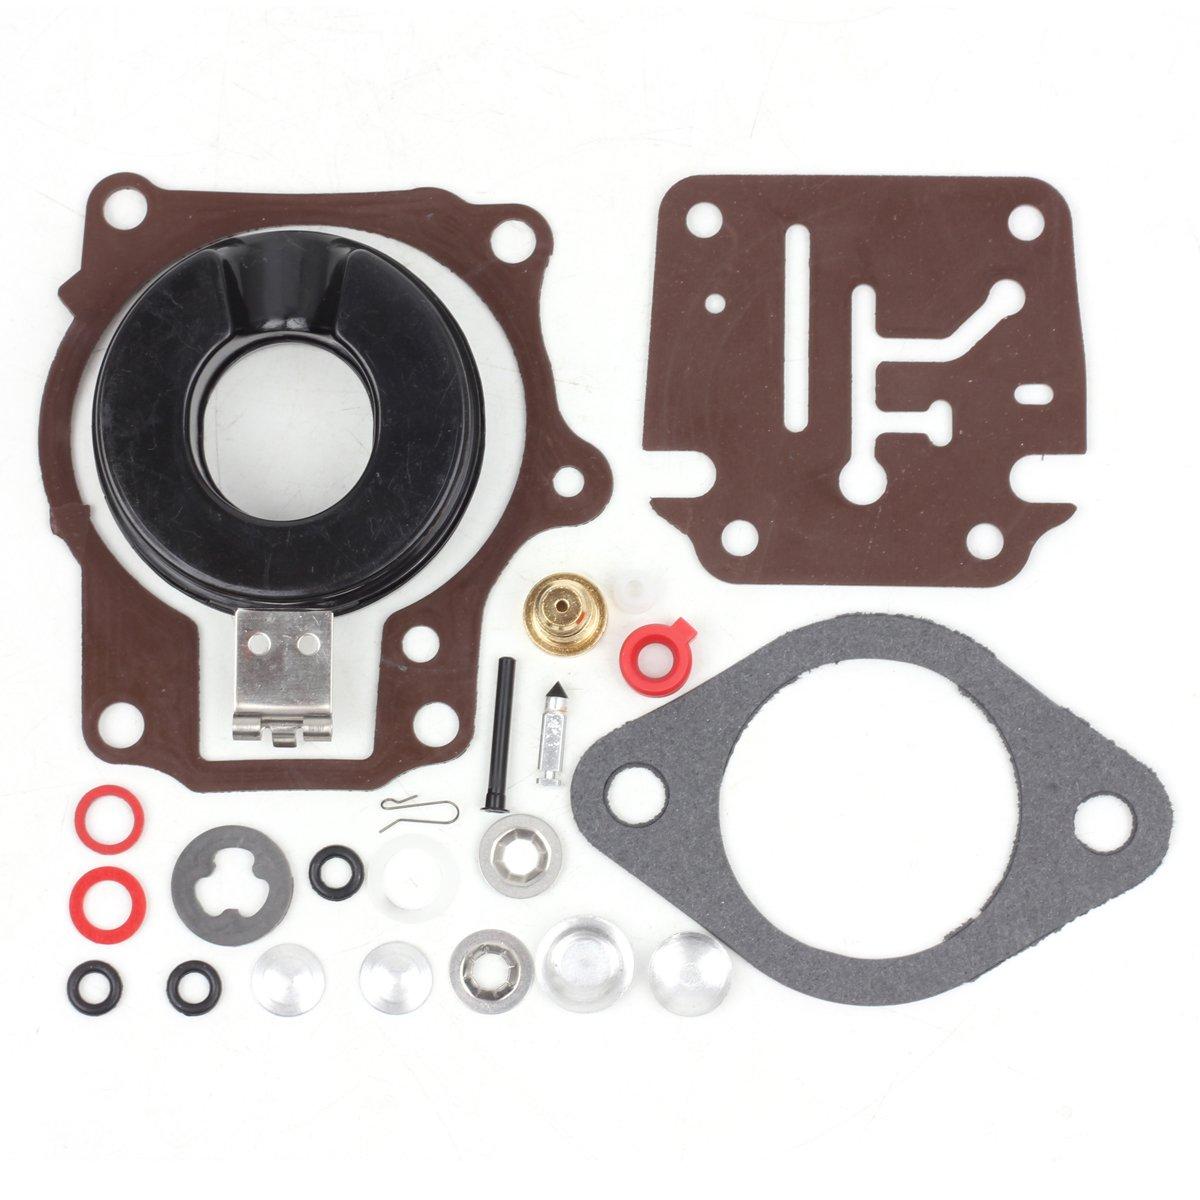 Cheap Evinrude Carburetor, find Evinrude Carburetor deals on line at